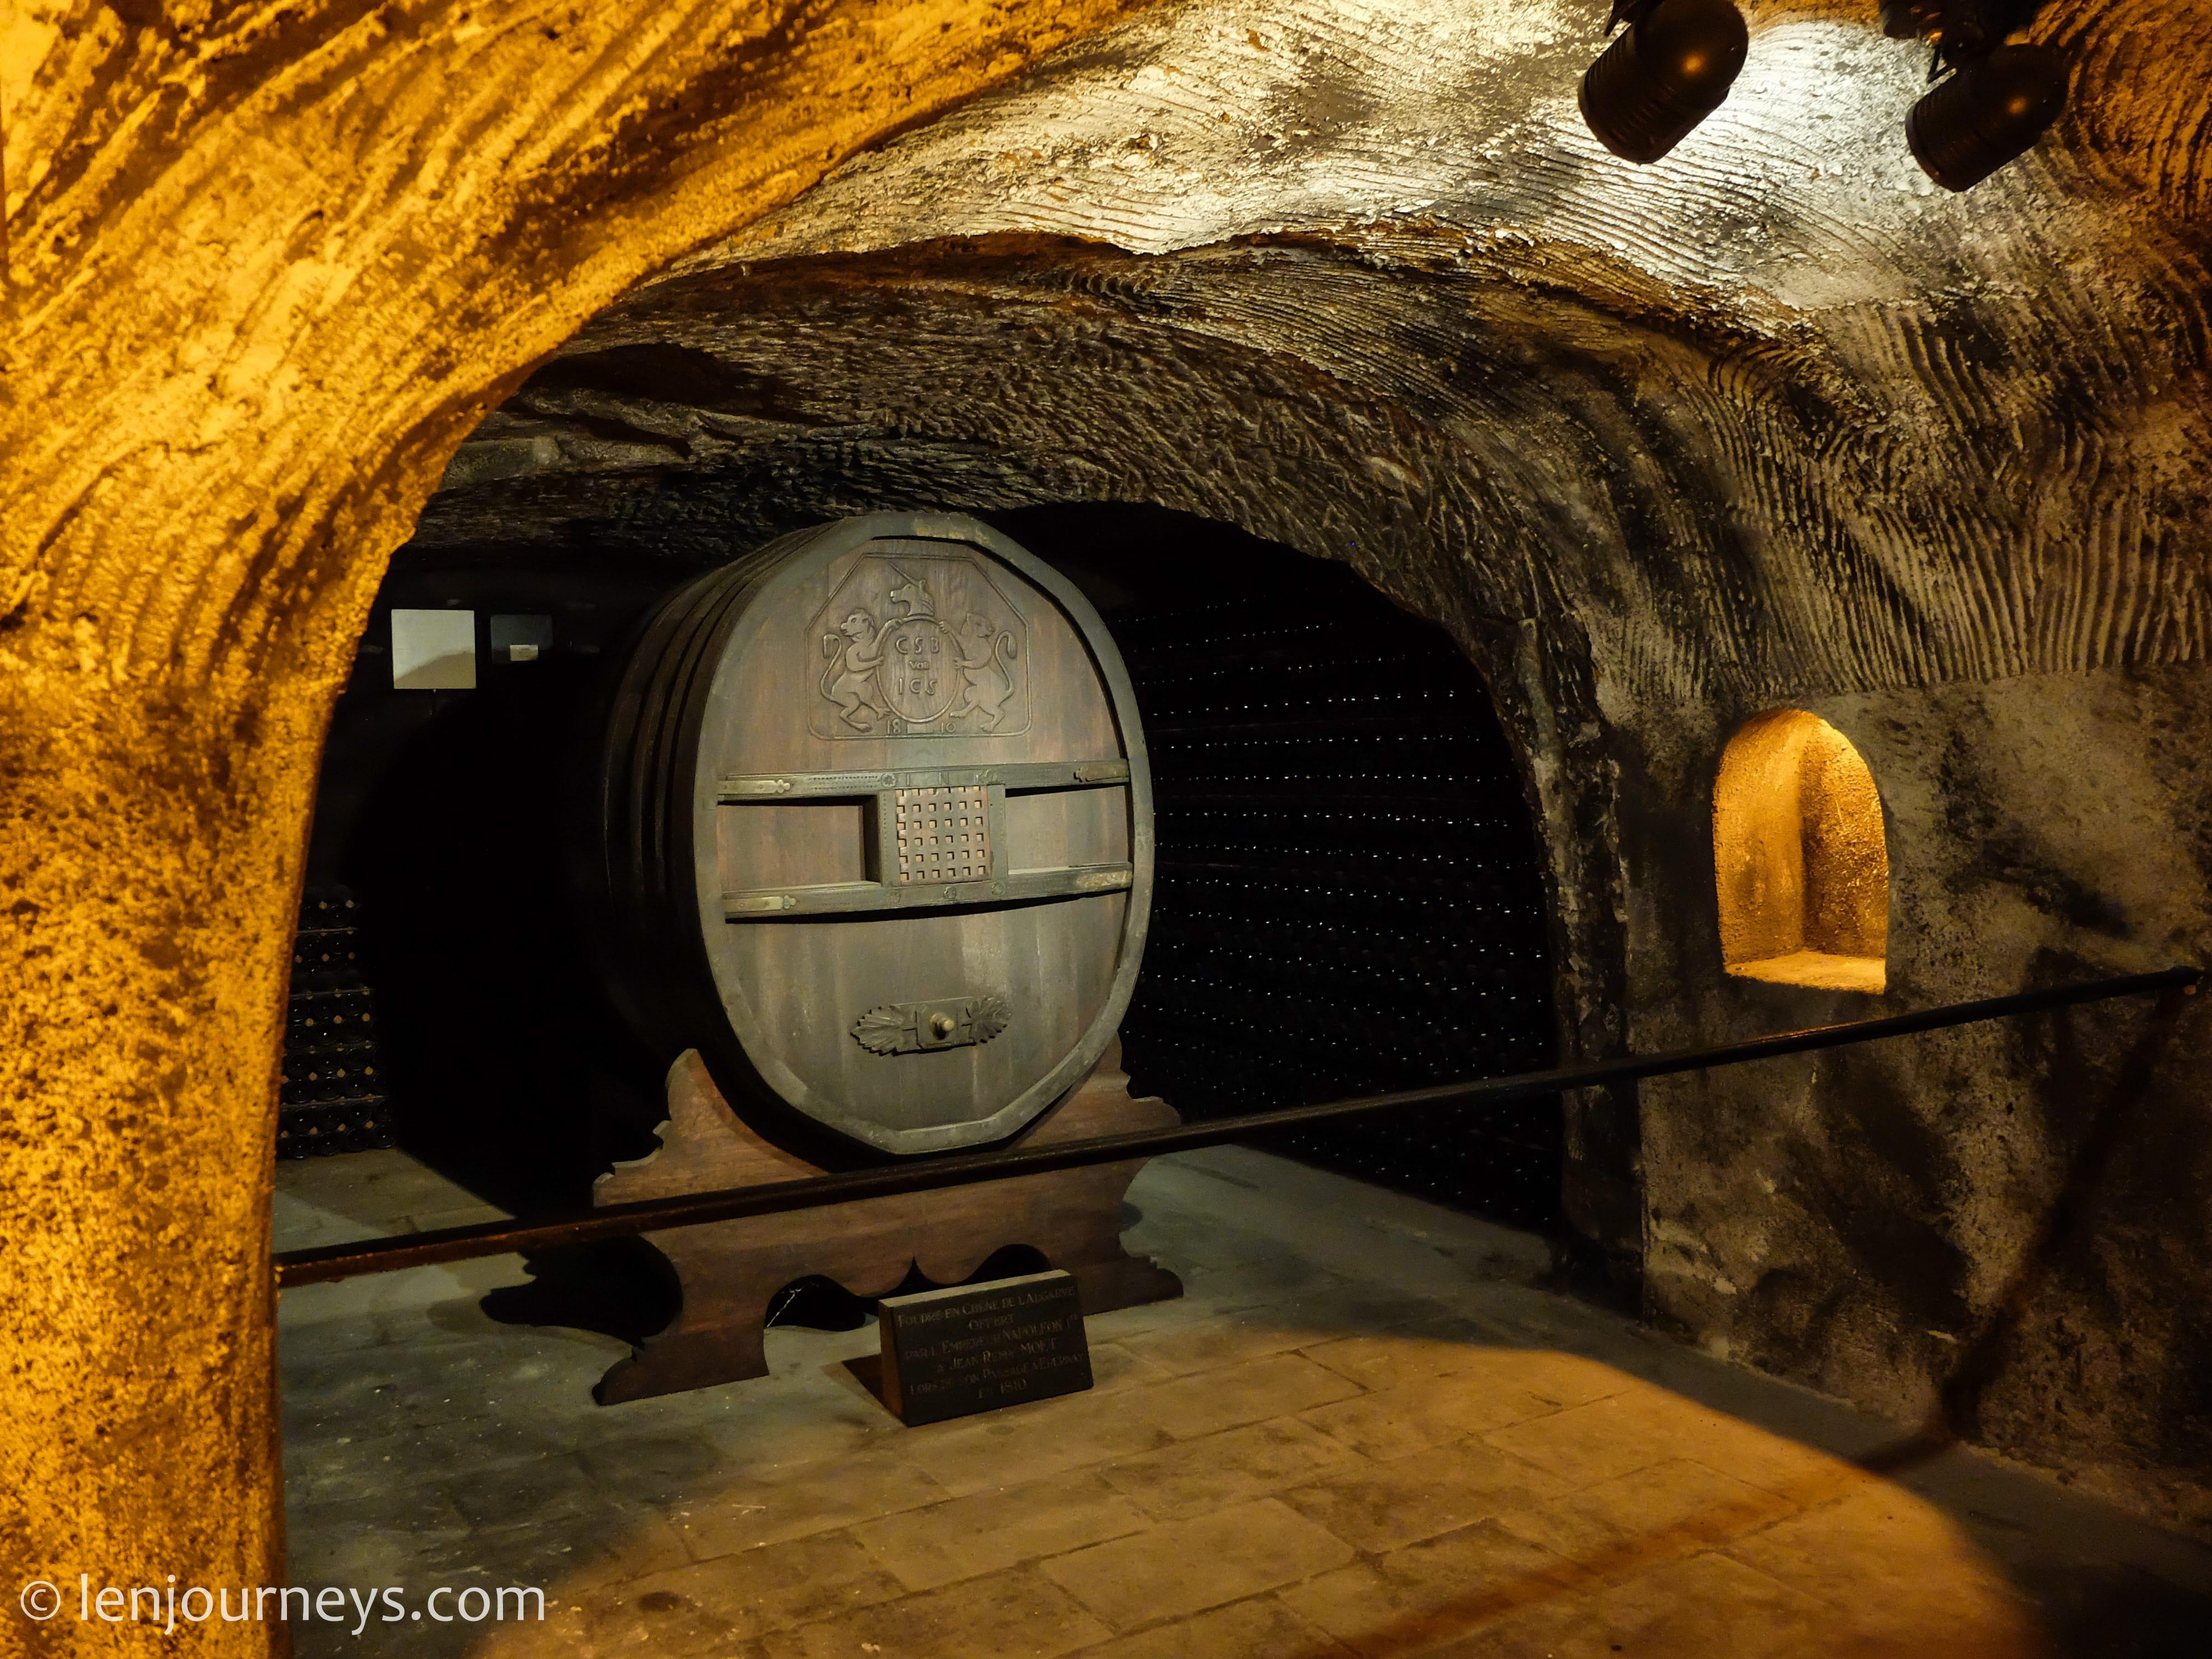 Wine barrel in Moët and Chandon Wine Cellar